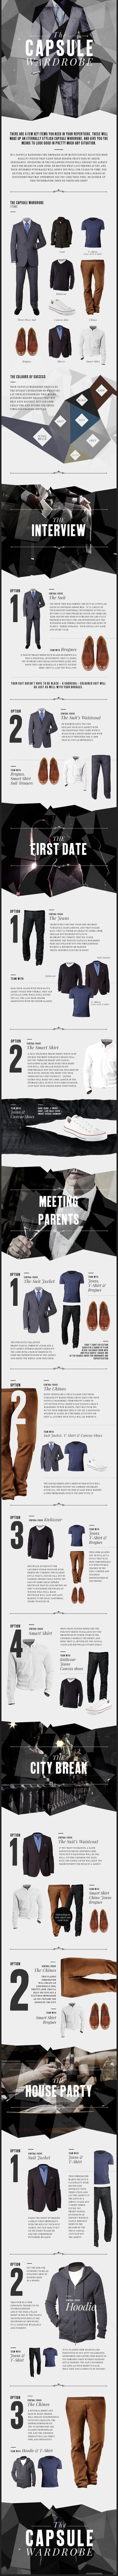 Capsule Wardrobe mens fashion. #essentials.